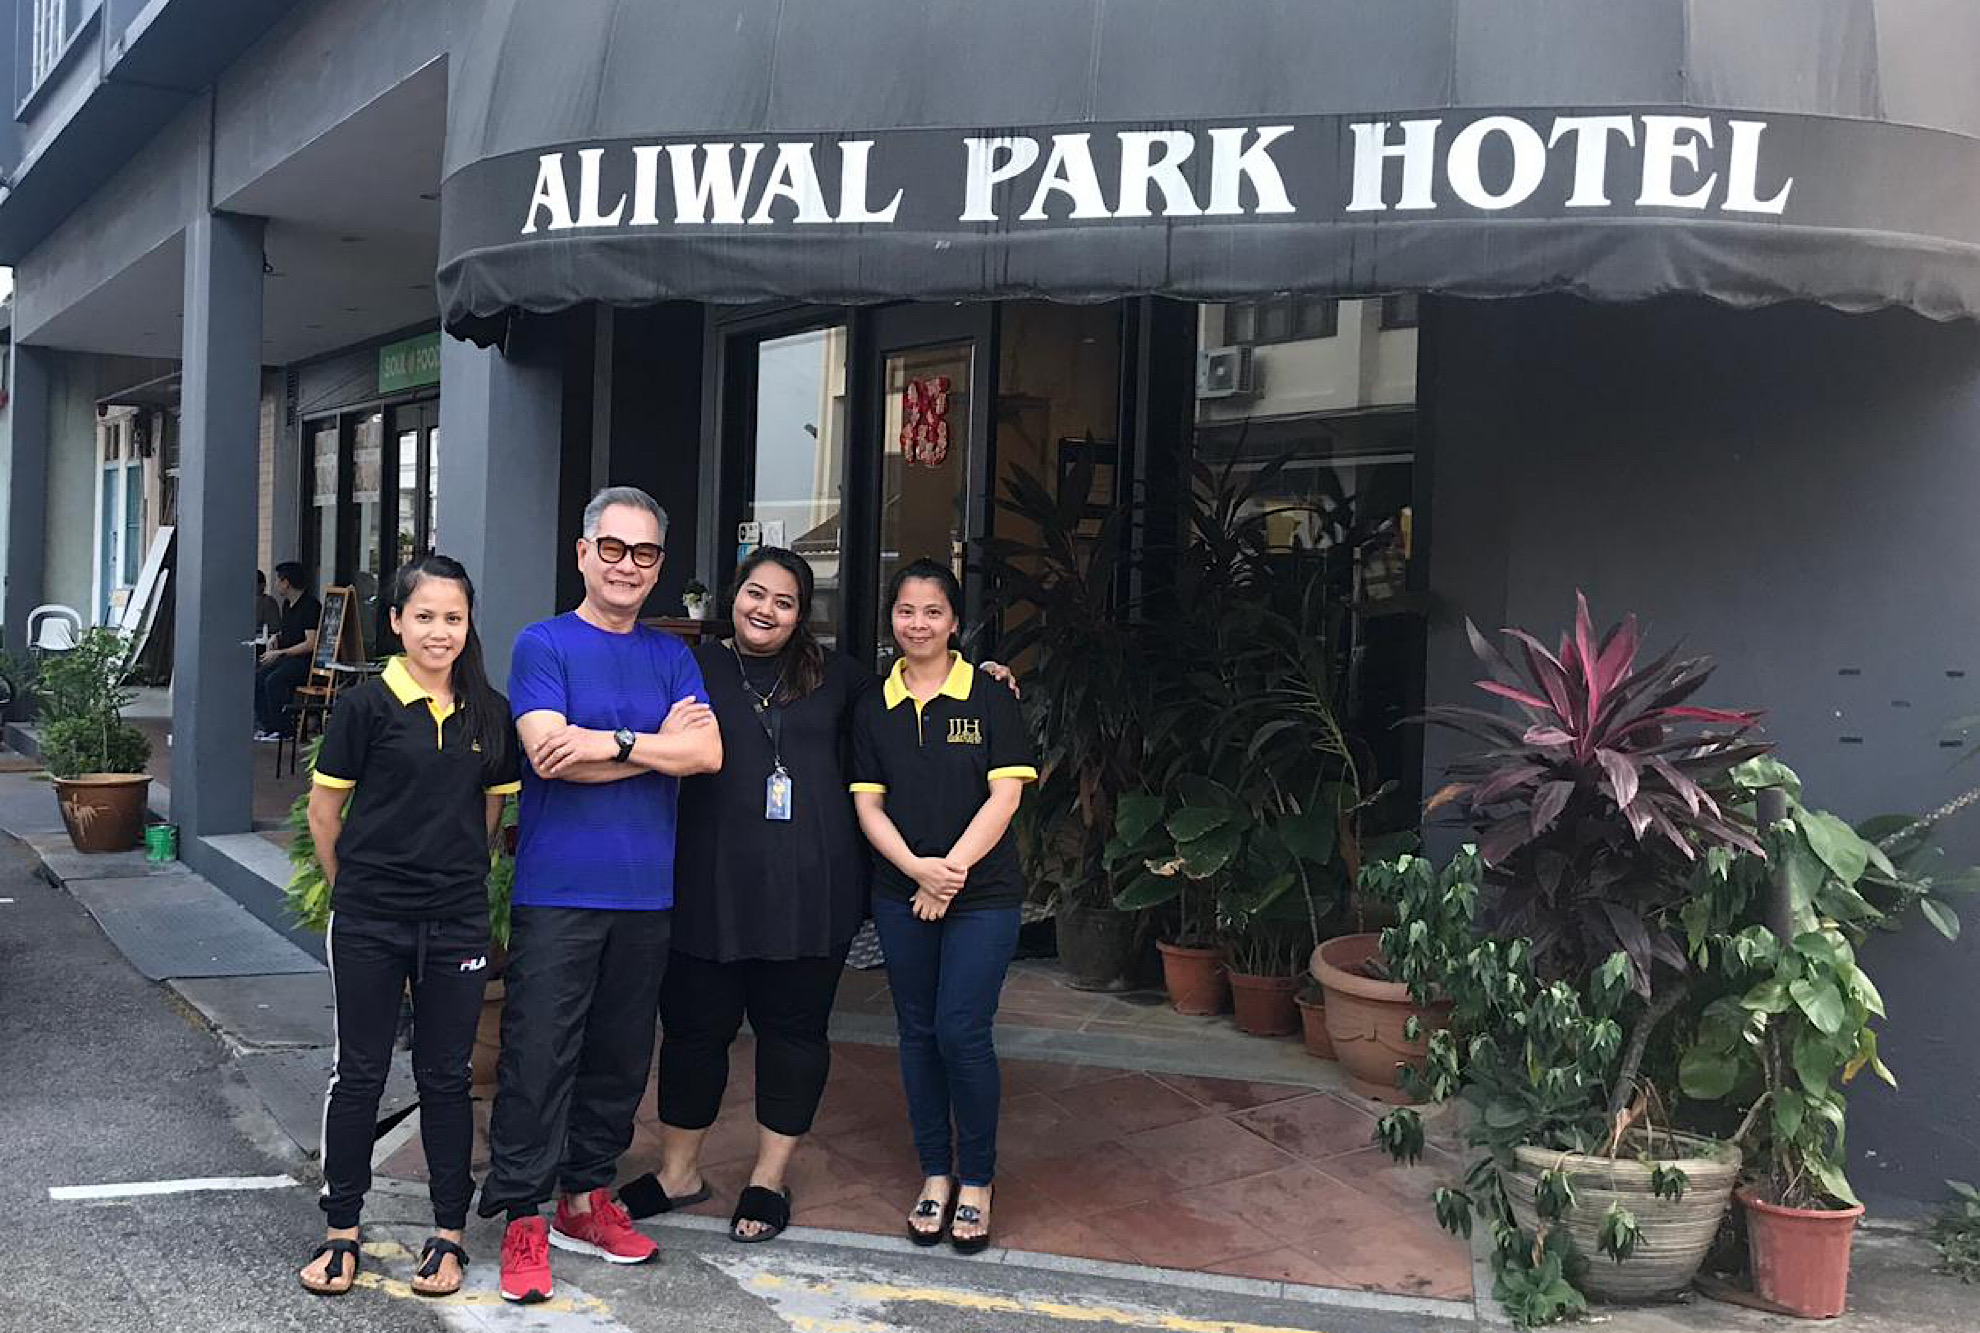 aliwal park hotel sg 01